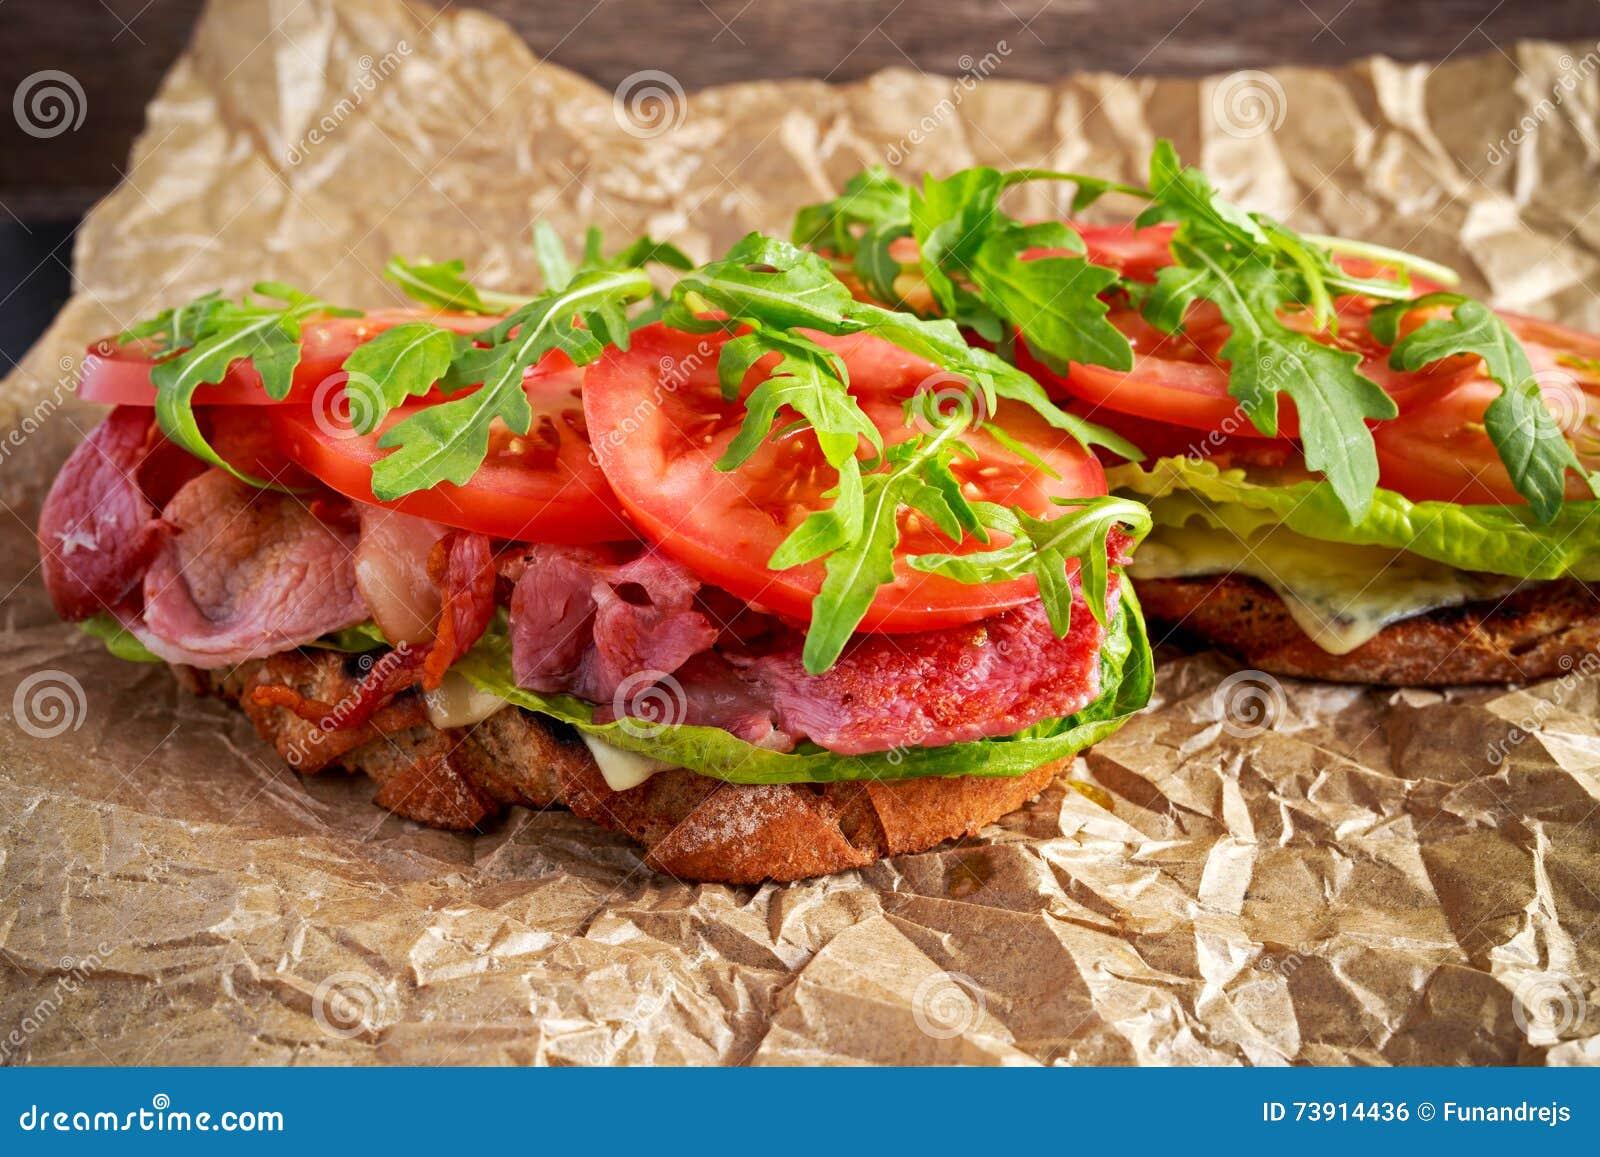 Verse eigengemaakte BLT-sandwich op geroosterd brood met bacon, sla, rundvleestomaat, rode uien, wilde raket en spaanders